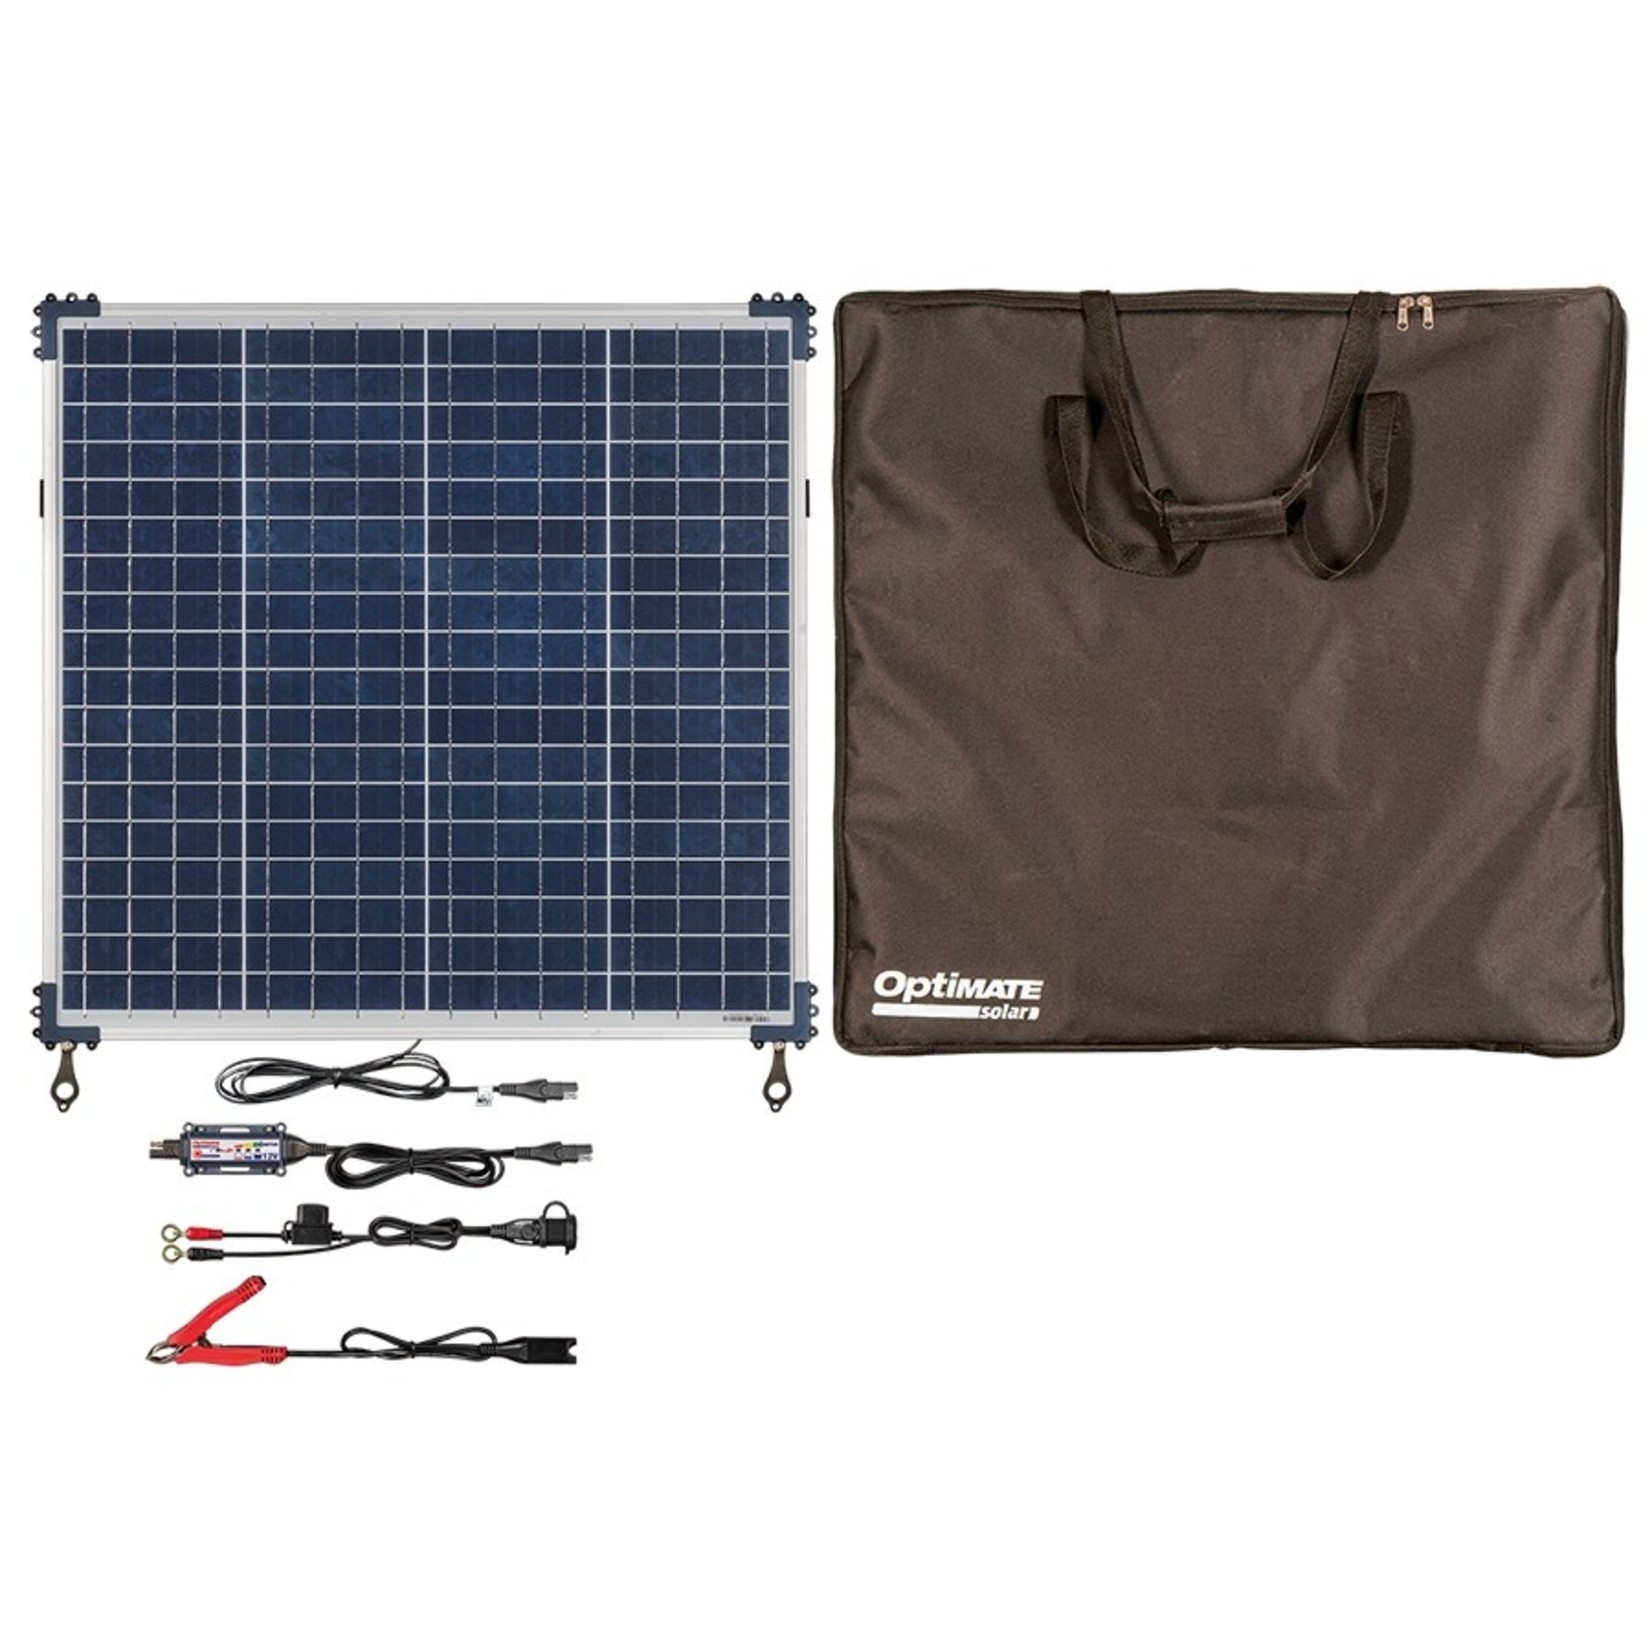 OptiMate Solar 60W - Travel Kit - Battery Charger